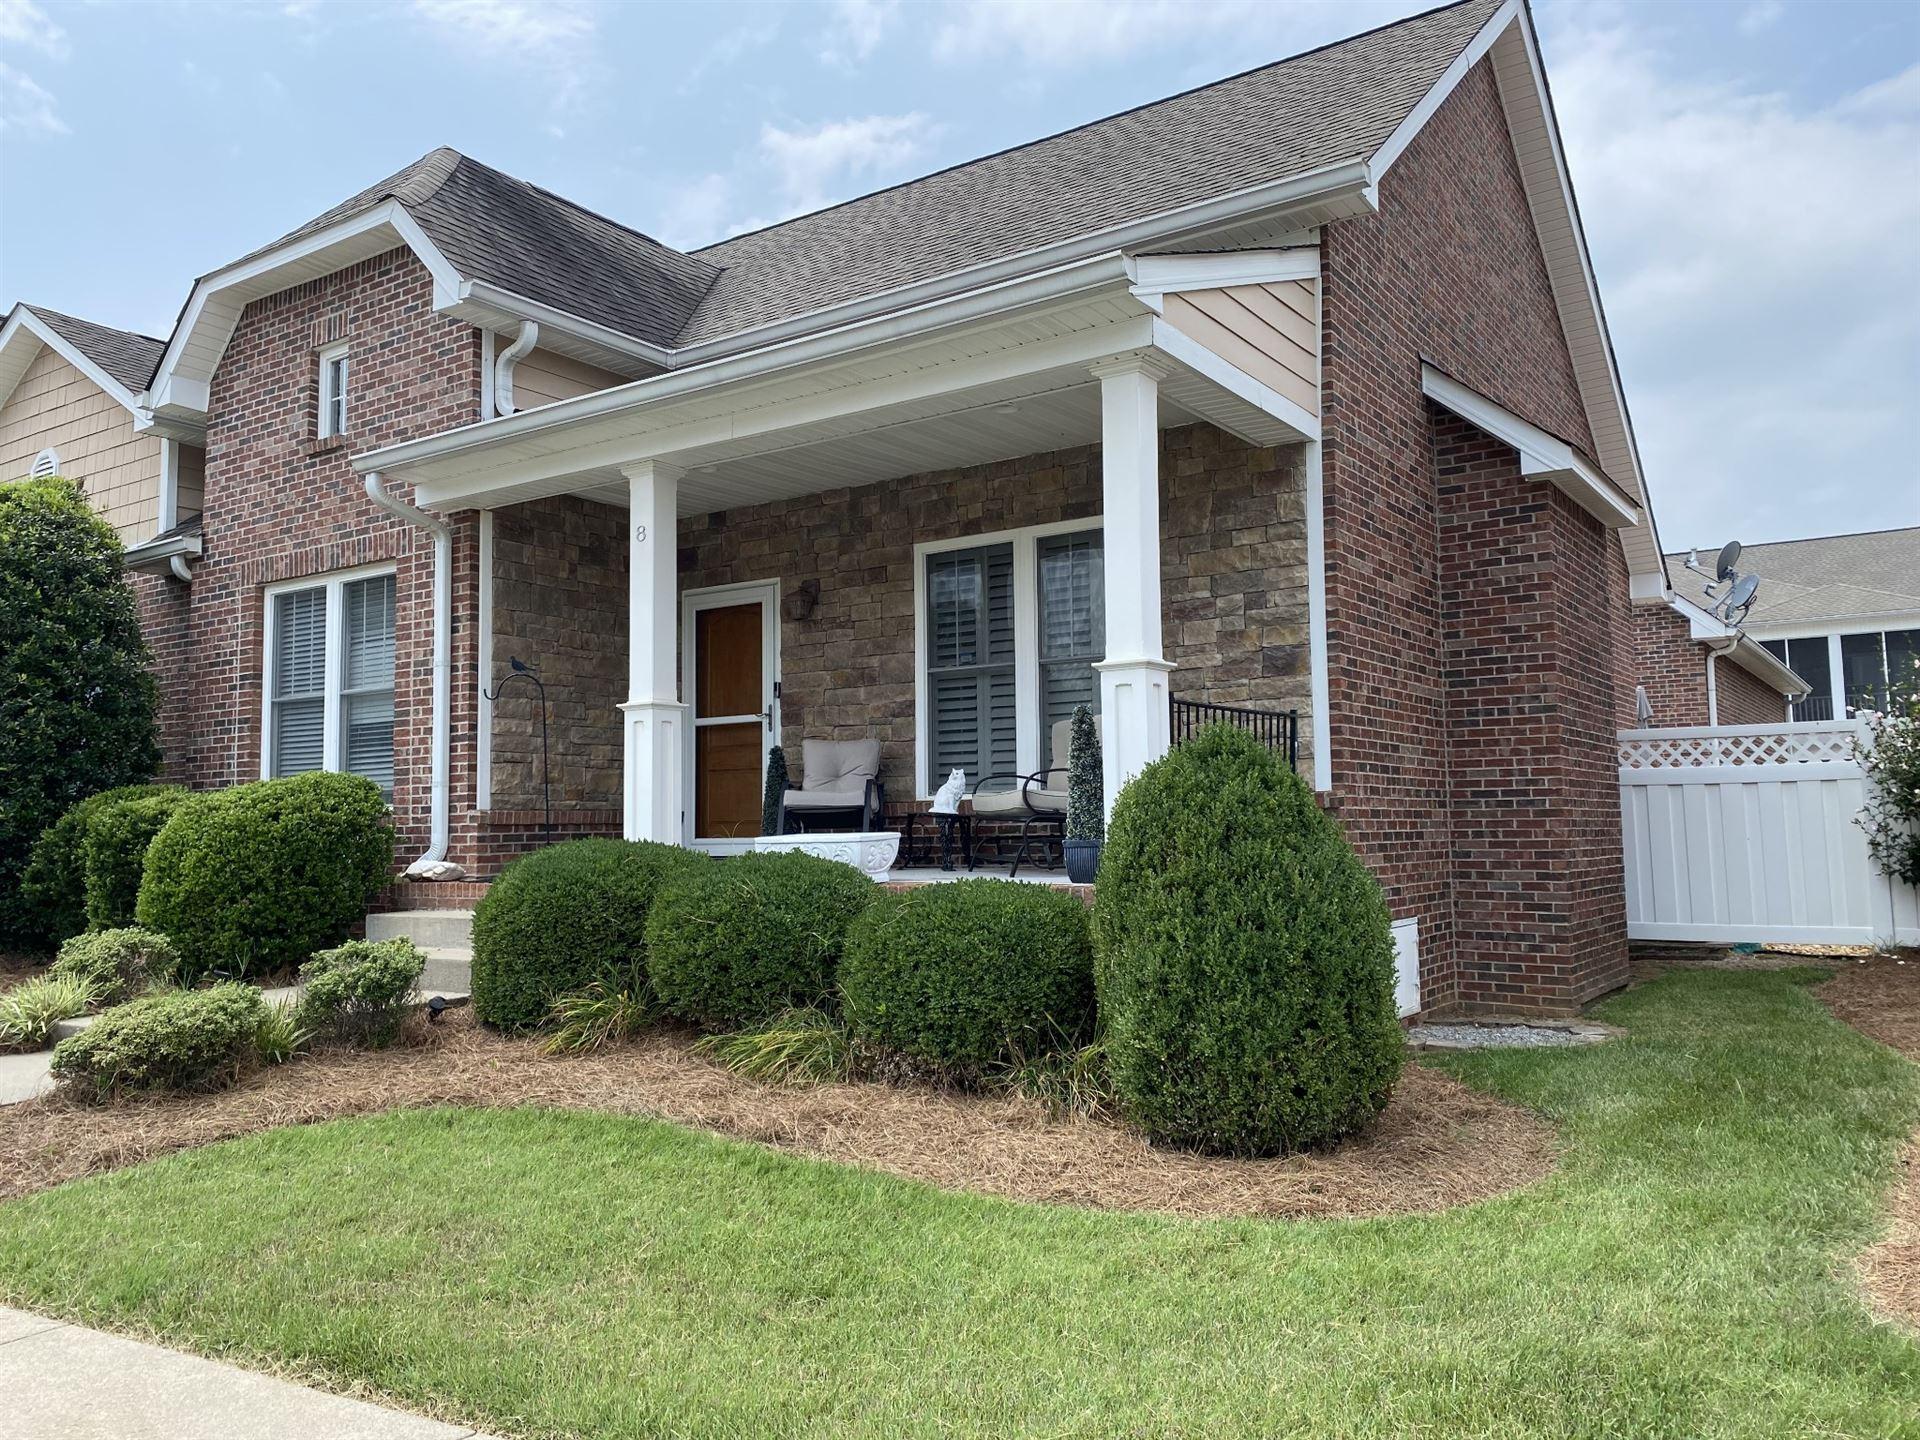 456 Pond Apple Rd #8, Clarksville, TN 37043 - MLS#: 2277178